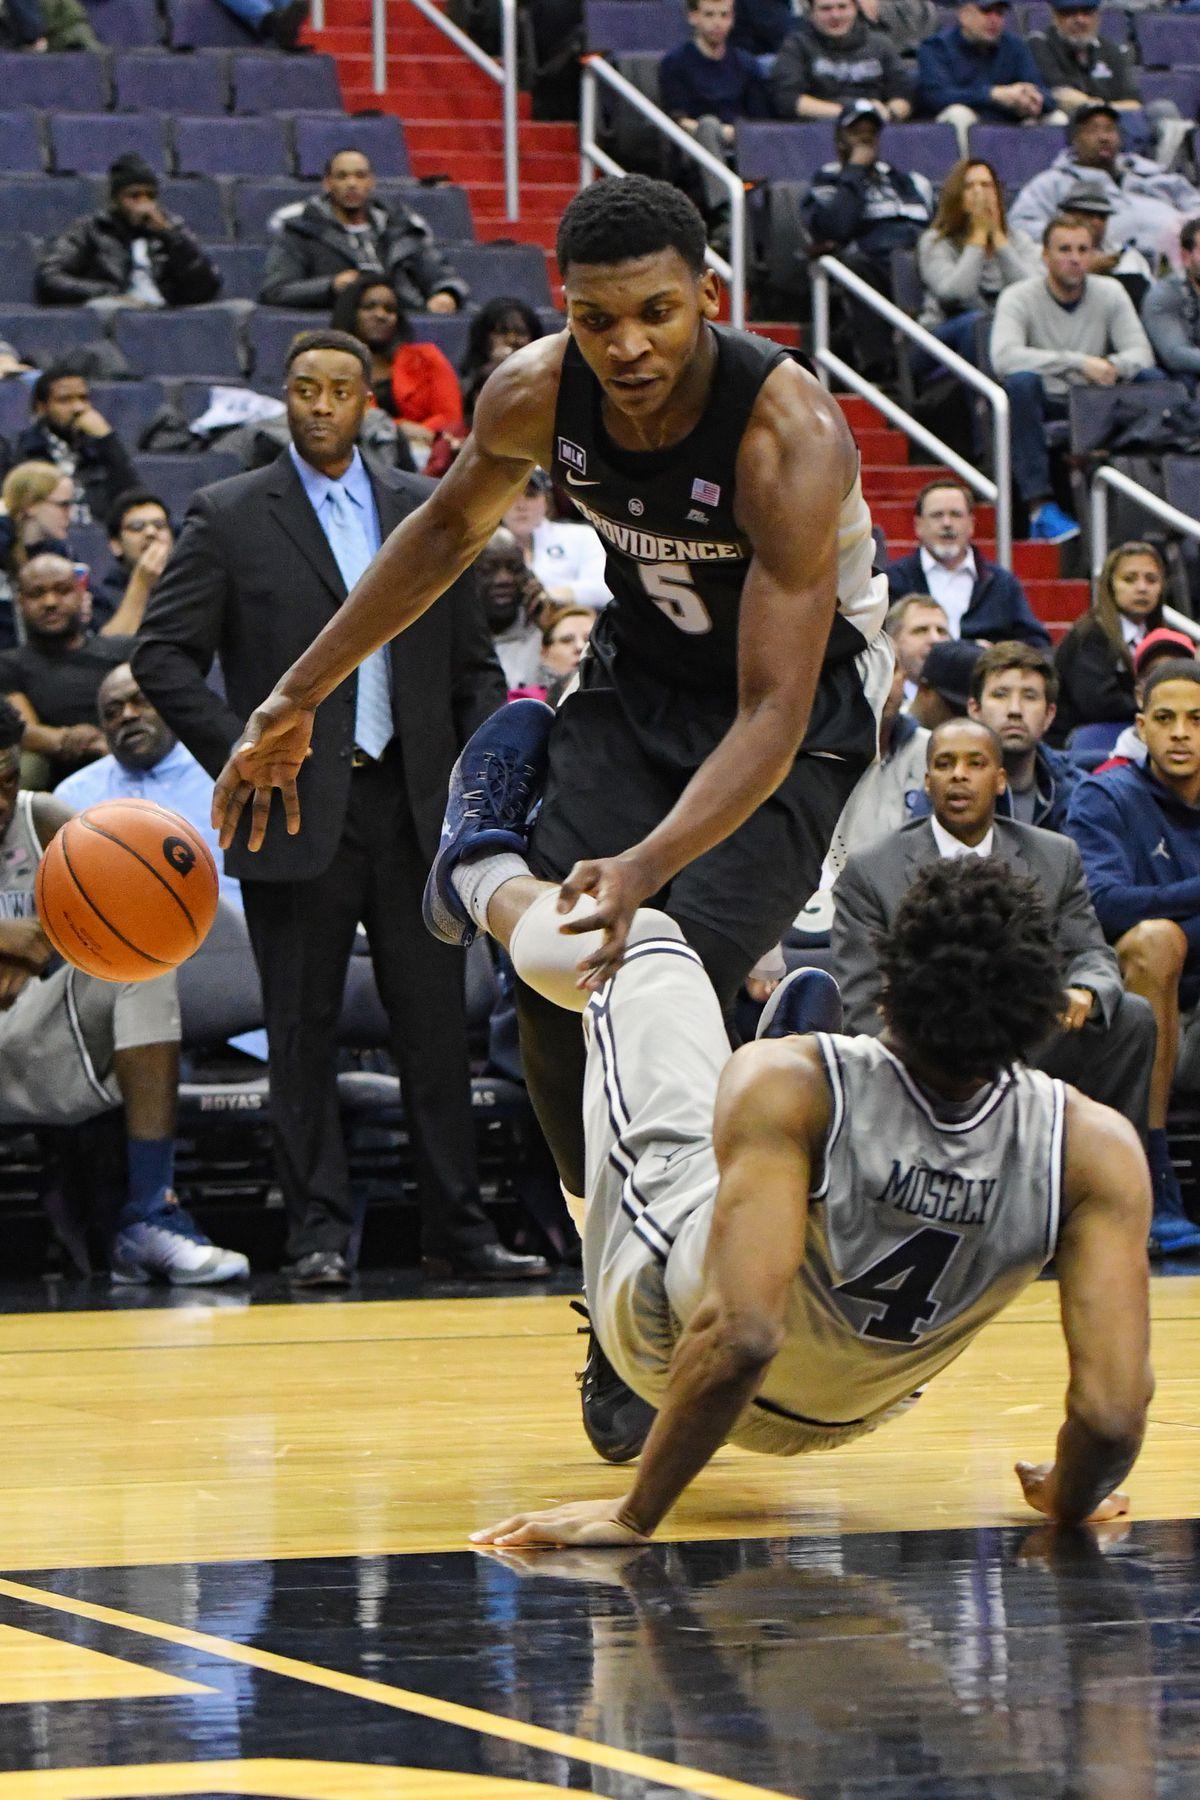 NCAA BASKETBALL: JAN 16 Providence at Georgetown